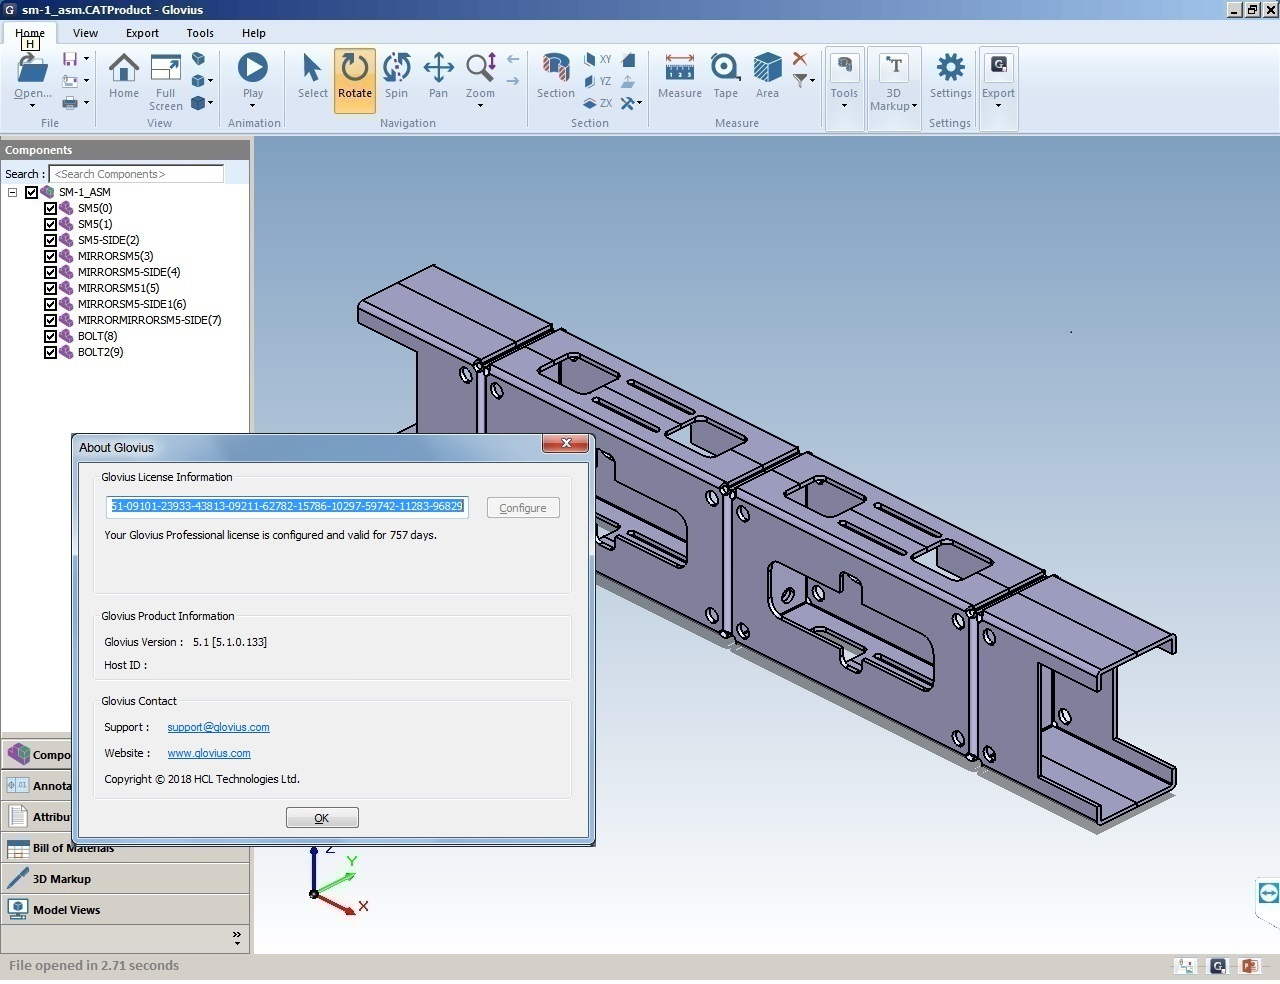 Working with Geometric Glovius Pro v5.1.0.133 full license